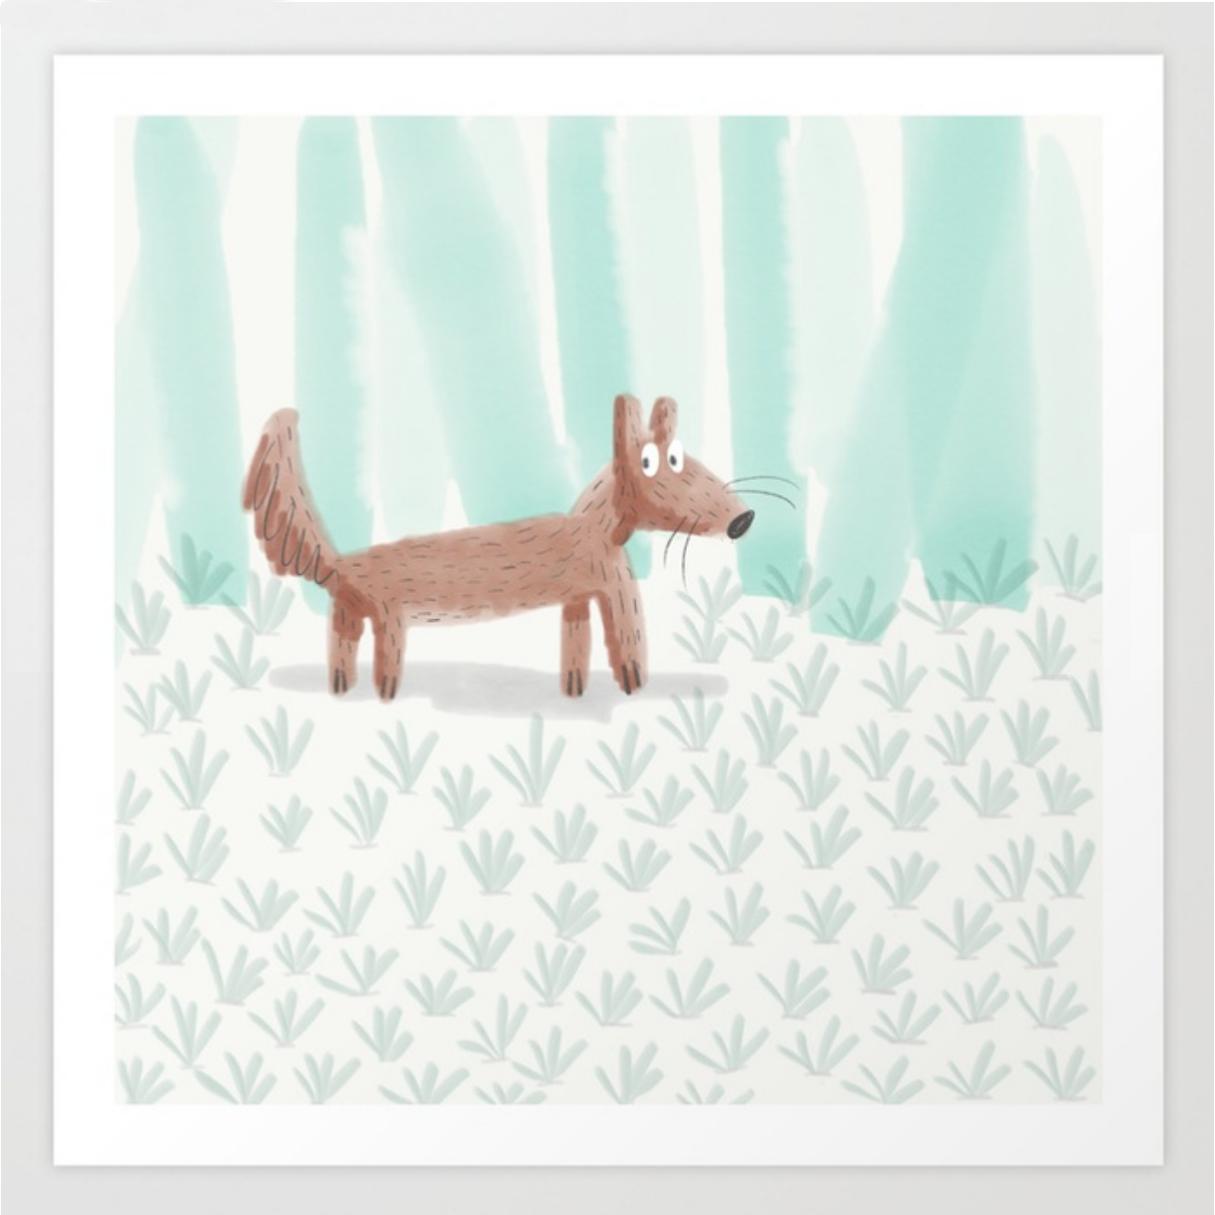 The Fox print